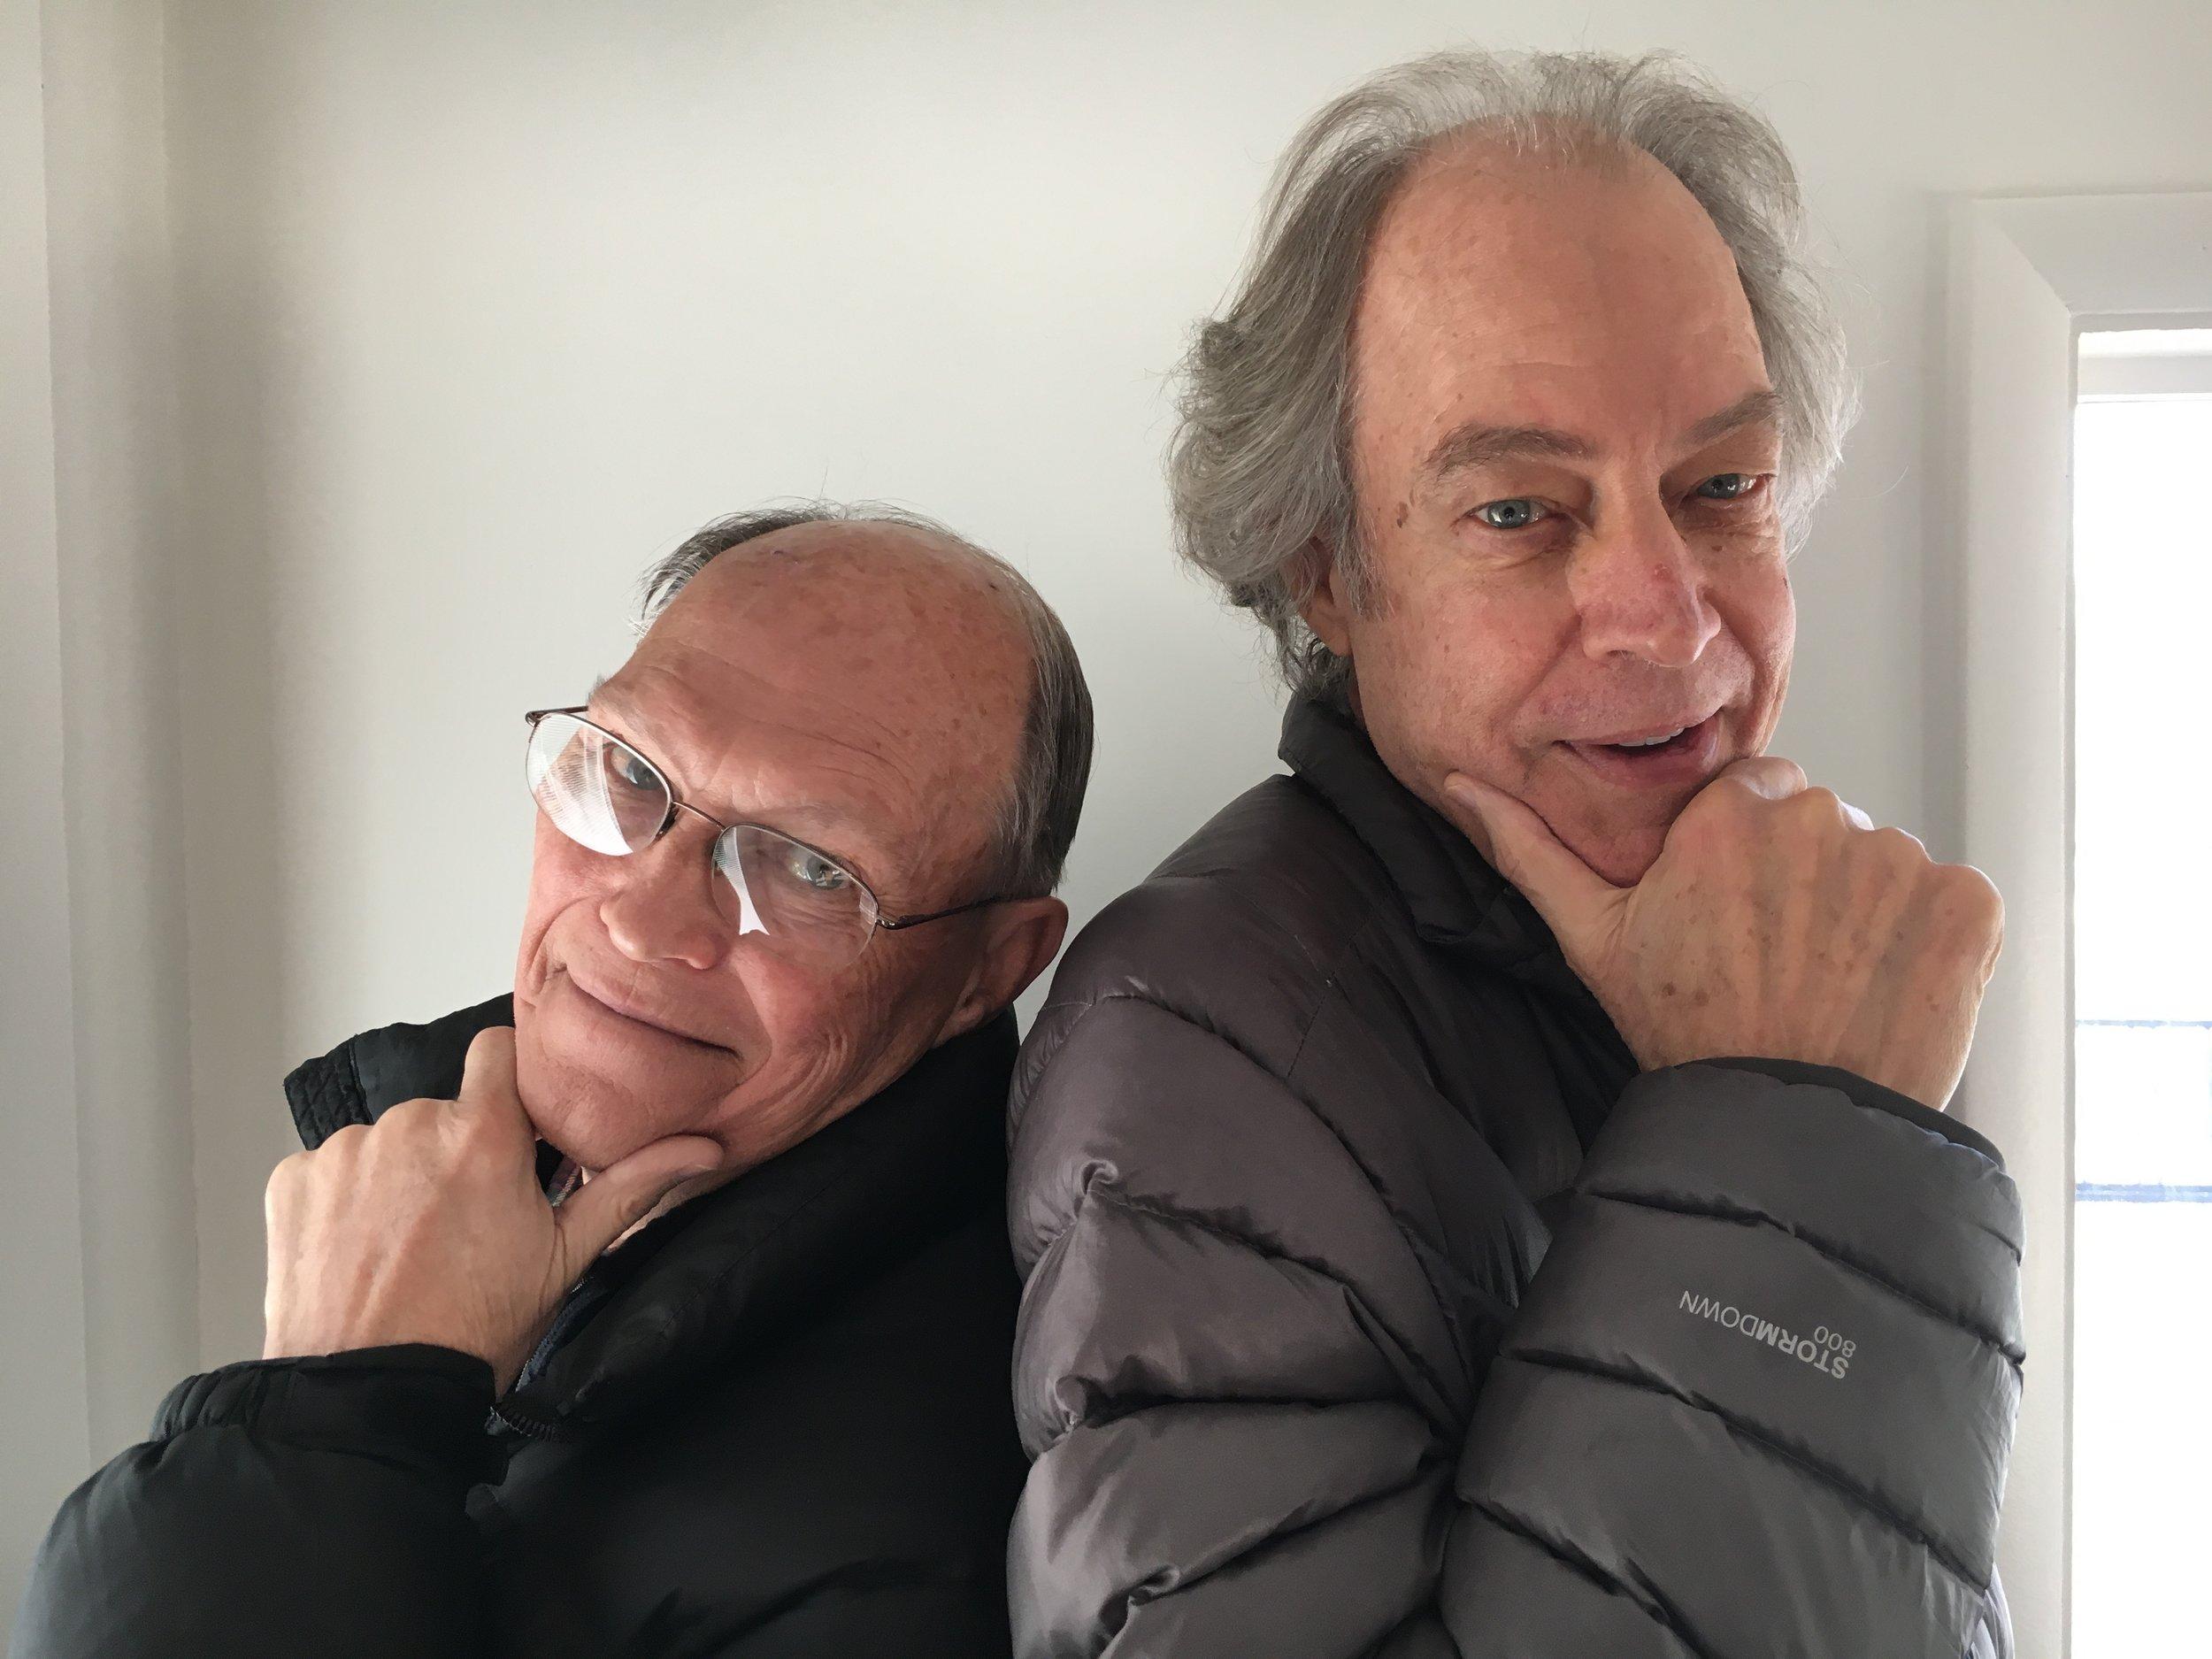 Meriwether's Friendship Ambassadors John and Dave